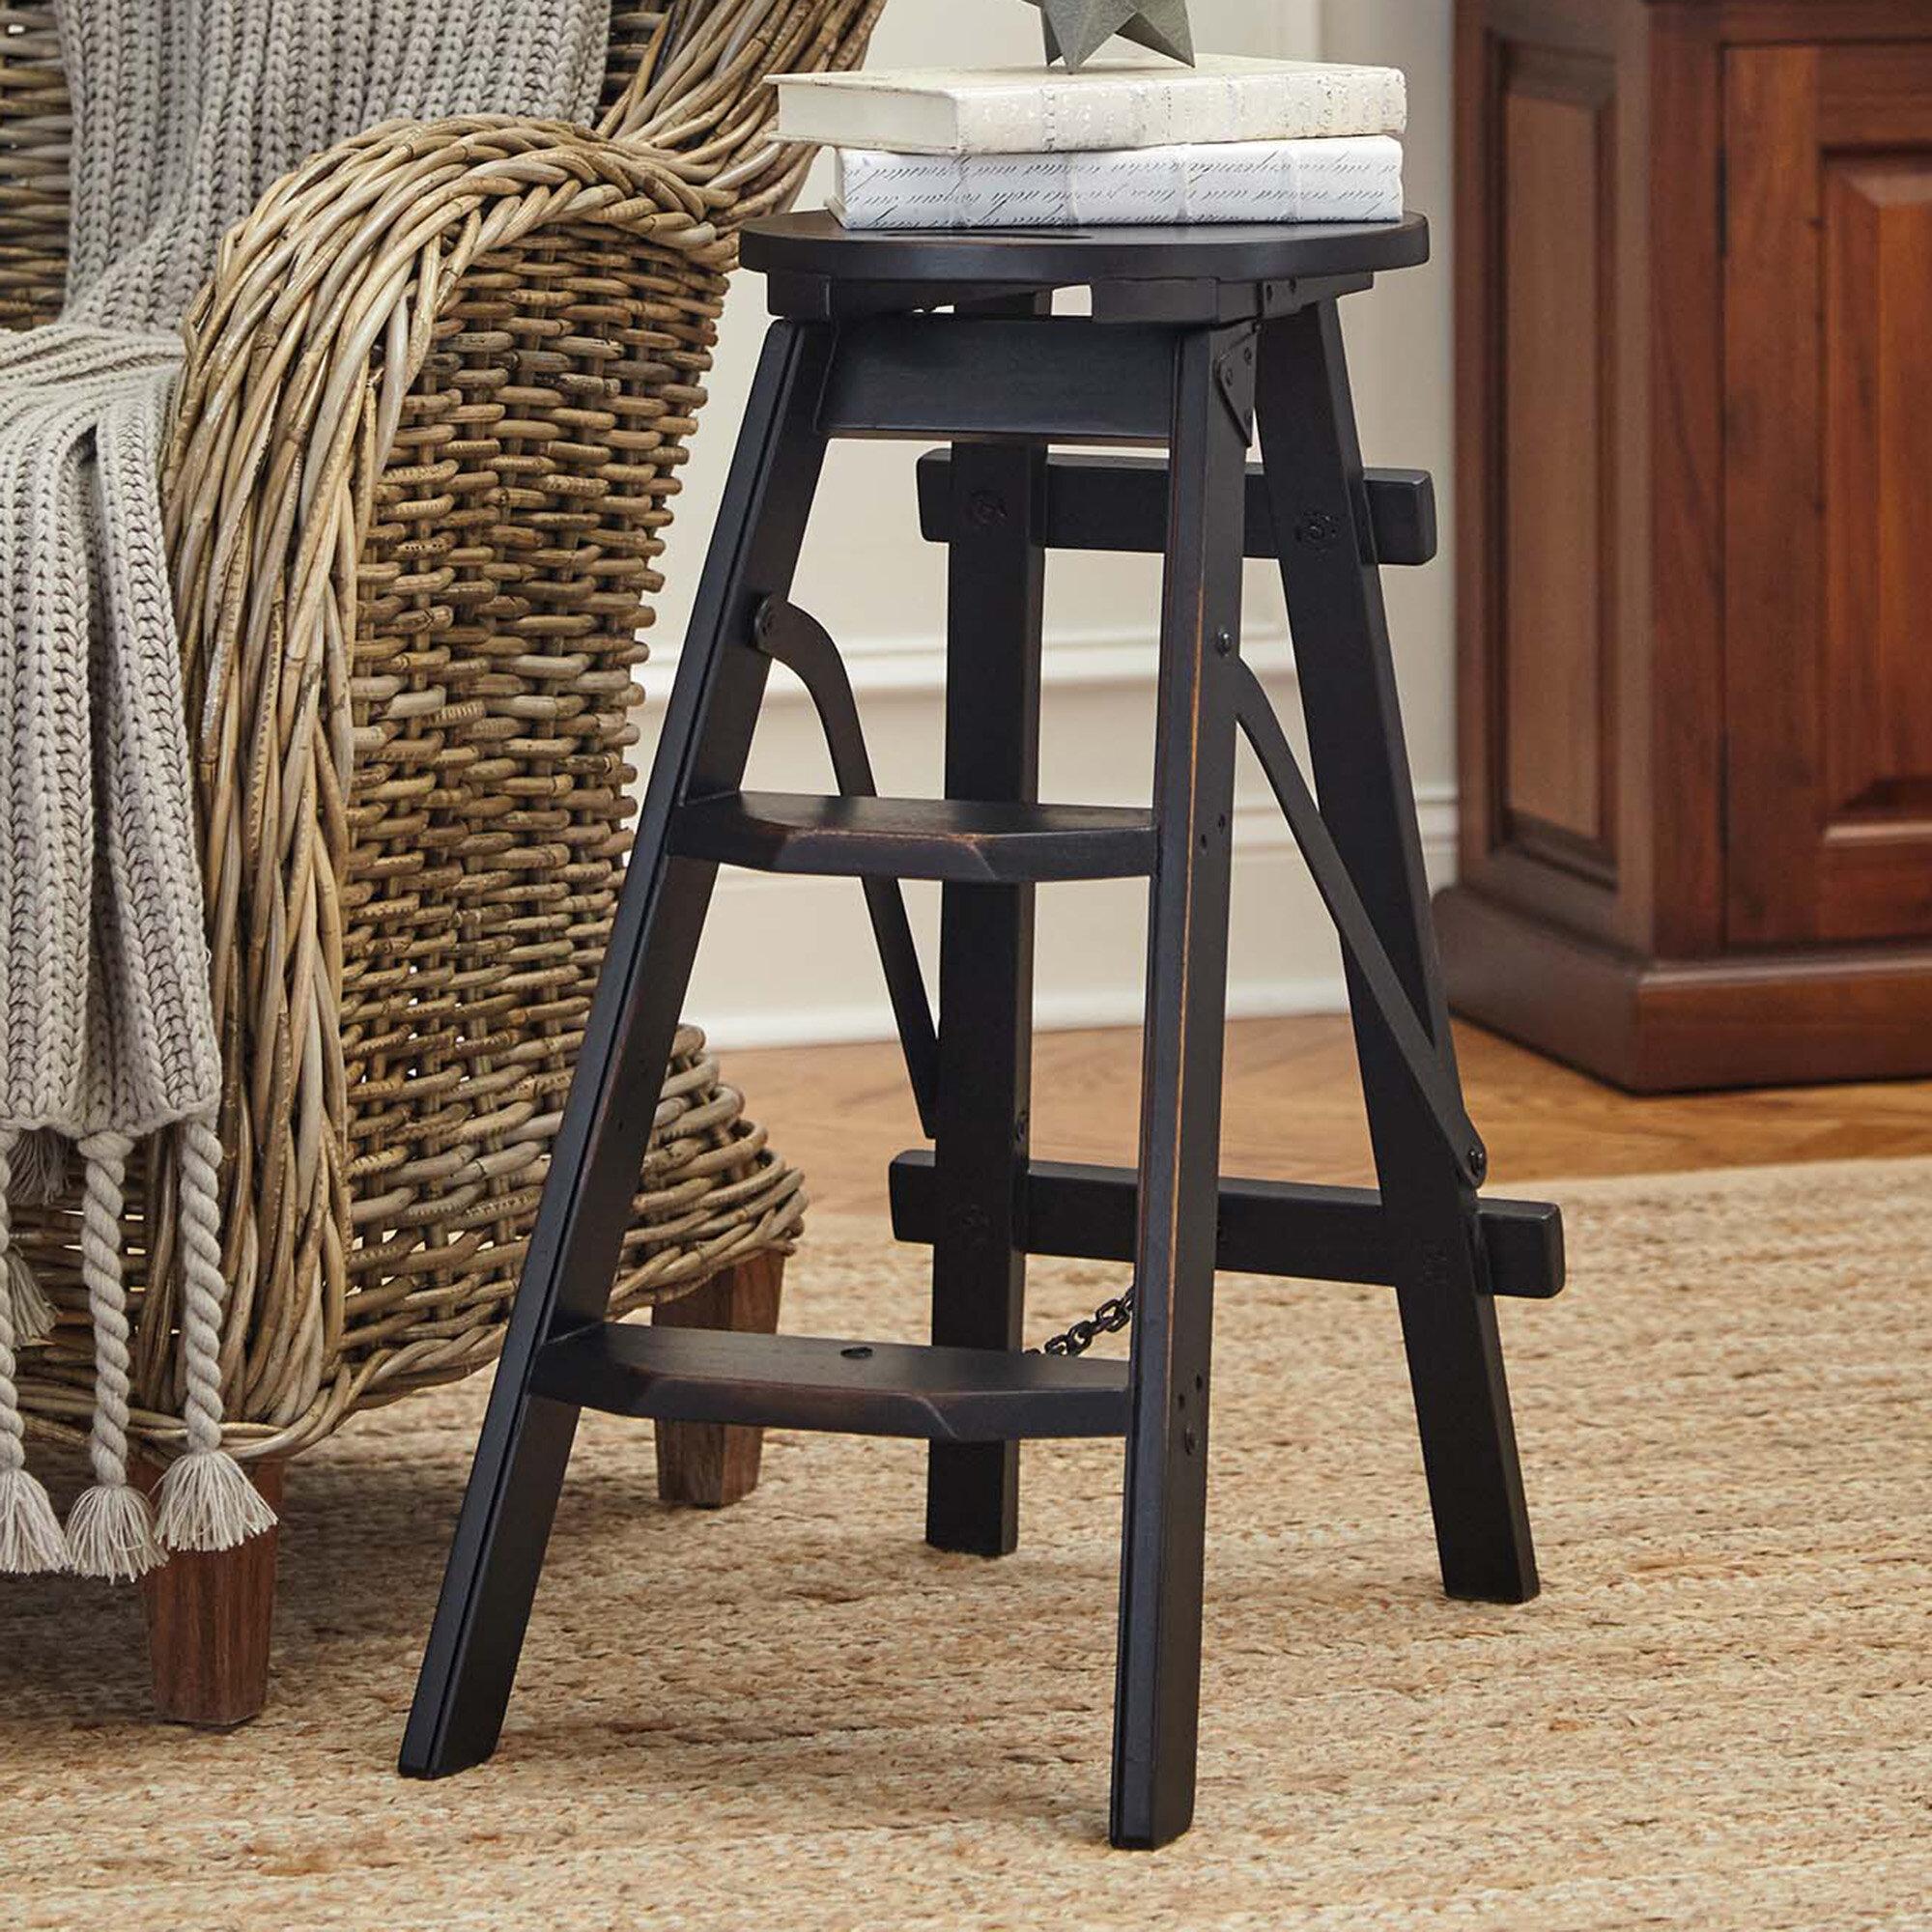 Brilliant Sayers 2 Steps Wood Step Stool With 200 Lb Load Capacity Inzonedesignstudio Interior Chair Design Inzonedesignstudiocom